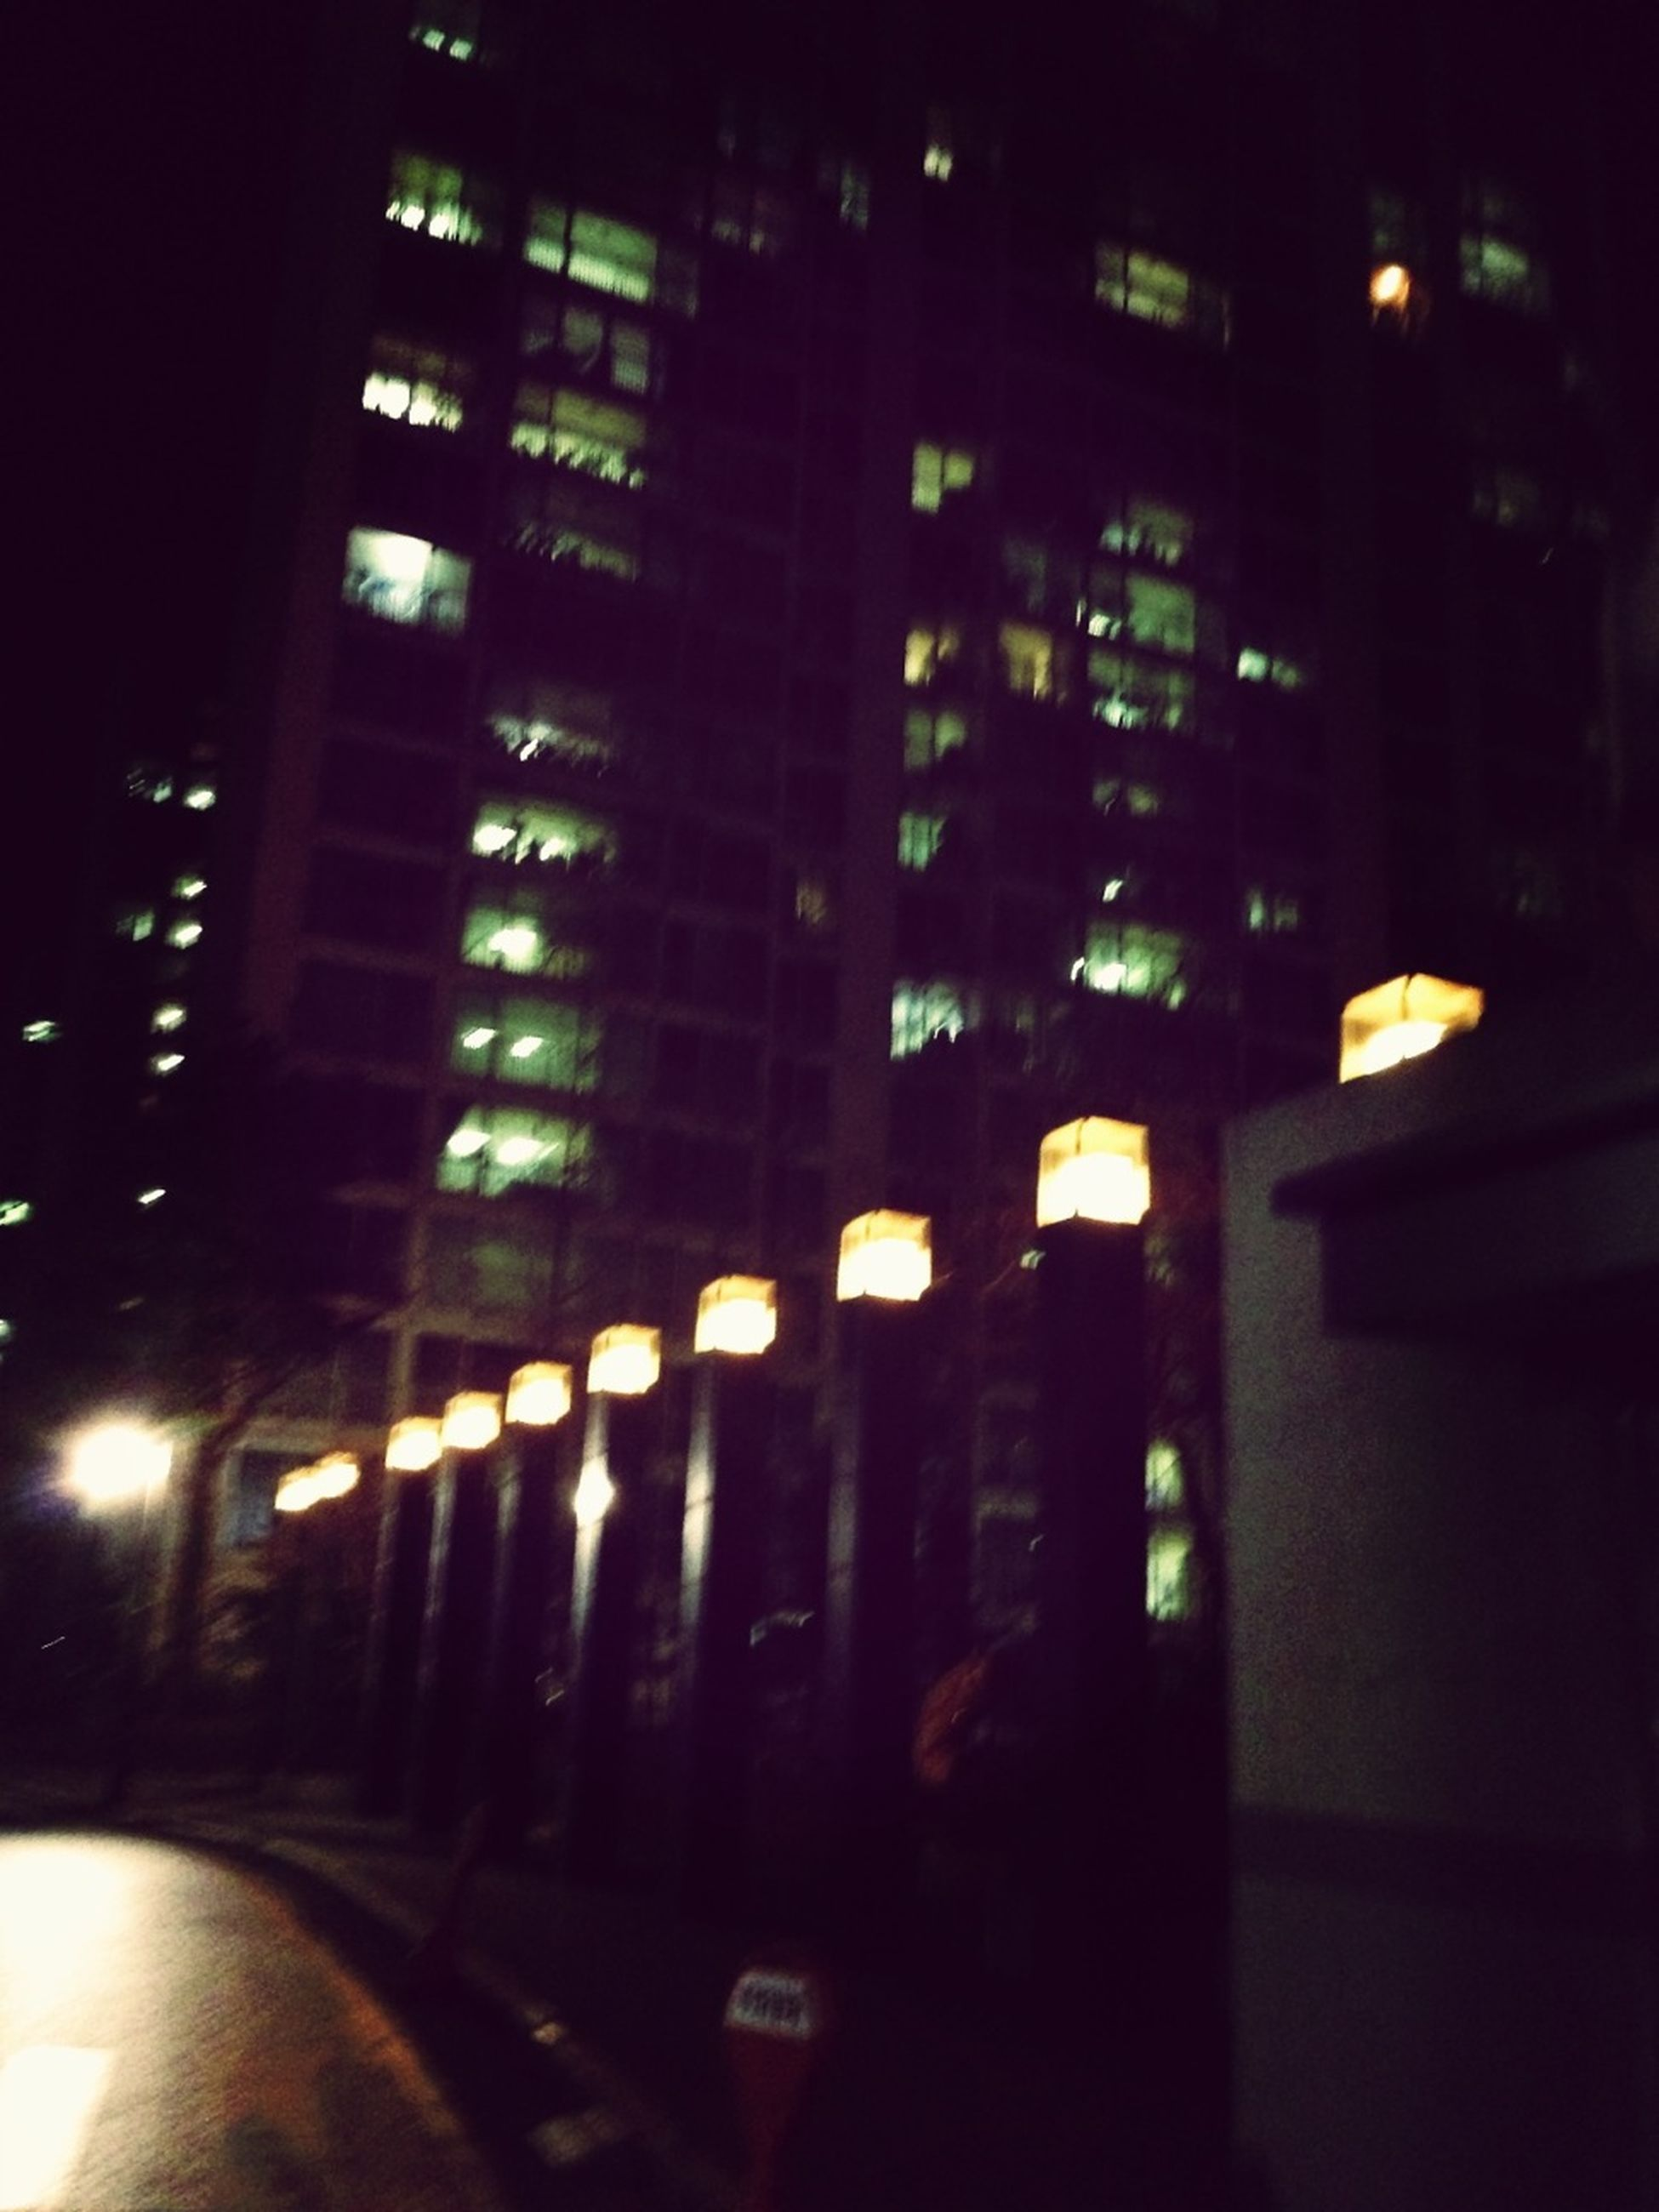 illuminated, building exterior, architecture, night, built structure, city, street, building, transportation, office building, city life, modern, city street, road, car, skyscraper, window, street light, light - natural phenomenon, outdoors